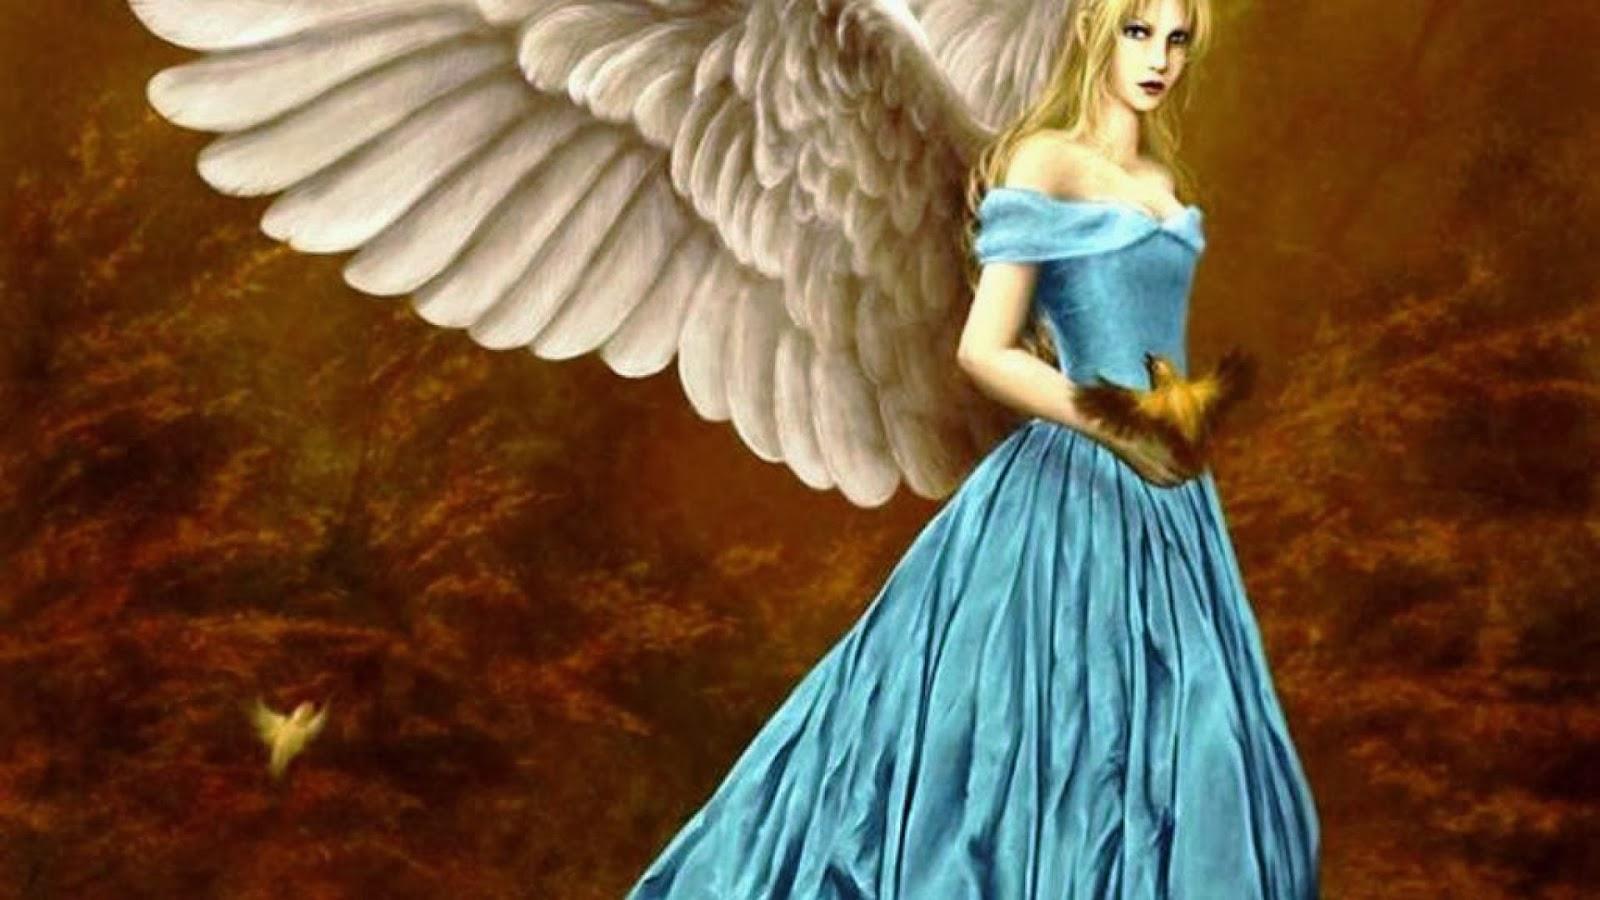 Cute Phan Wallpapers Angels And Doves Wallpaper Beautiful Desktop Wallpapers 2014